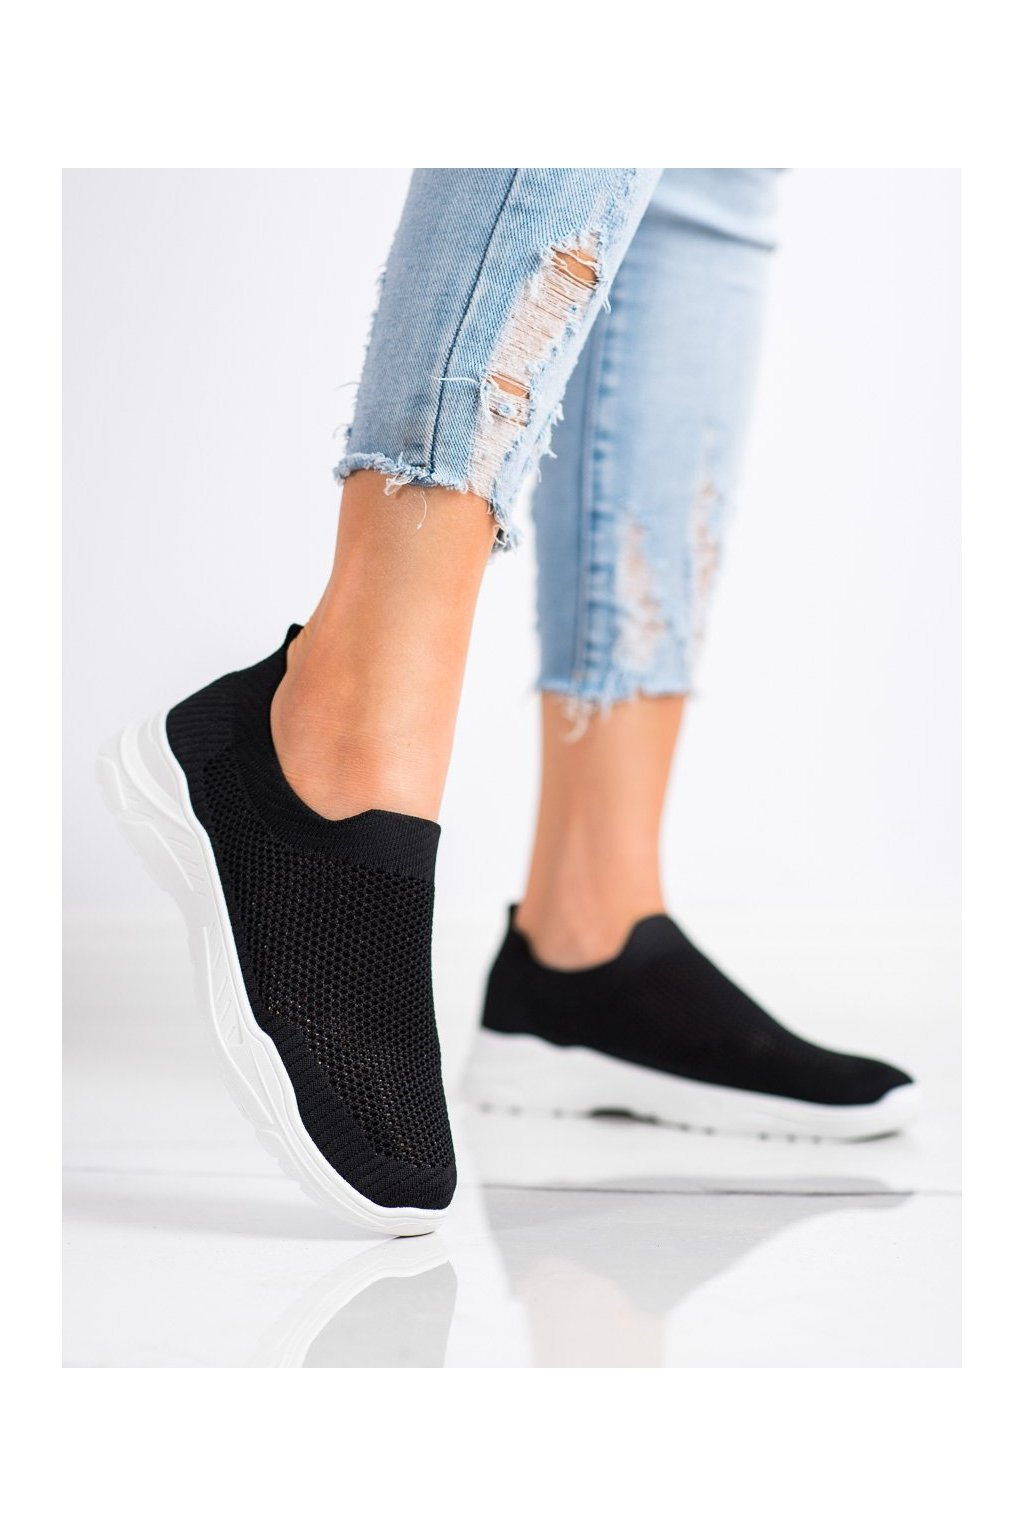 Čierne tenisky Ideal shoes kod 9865B